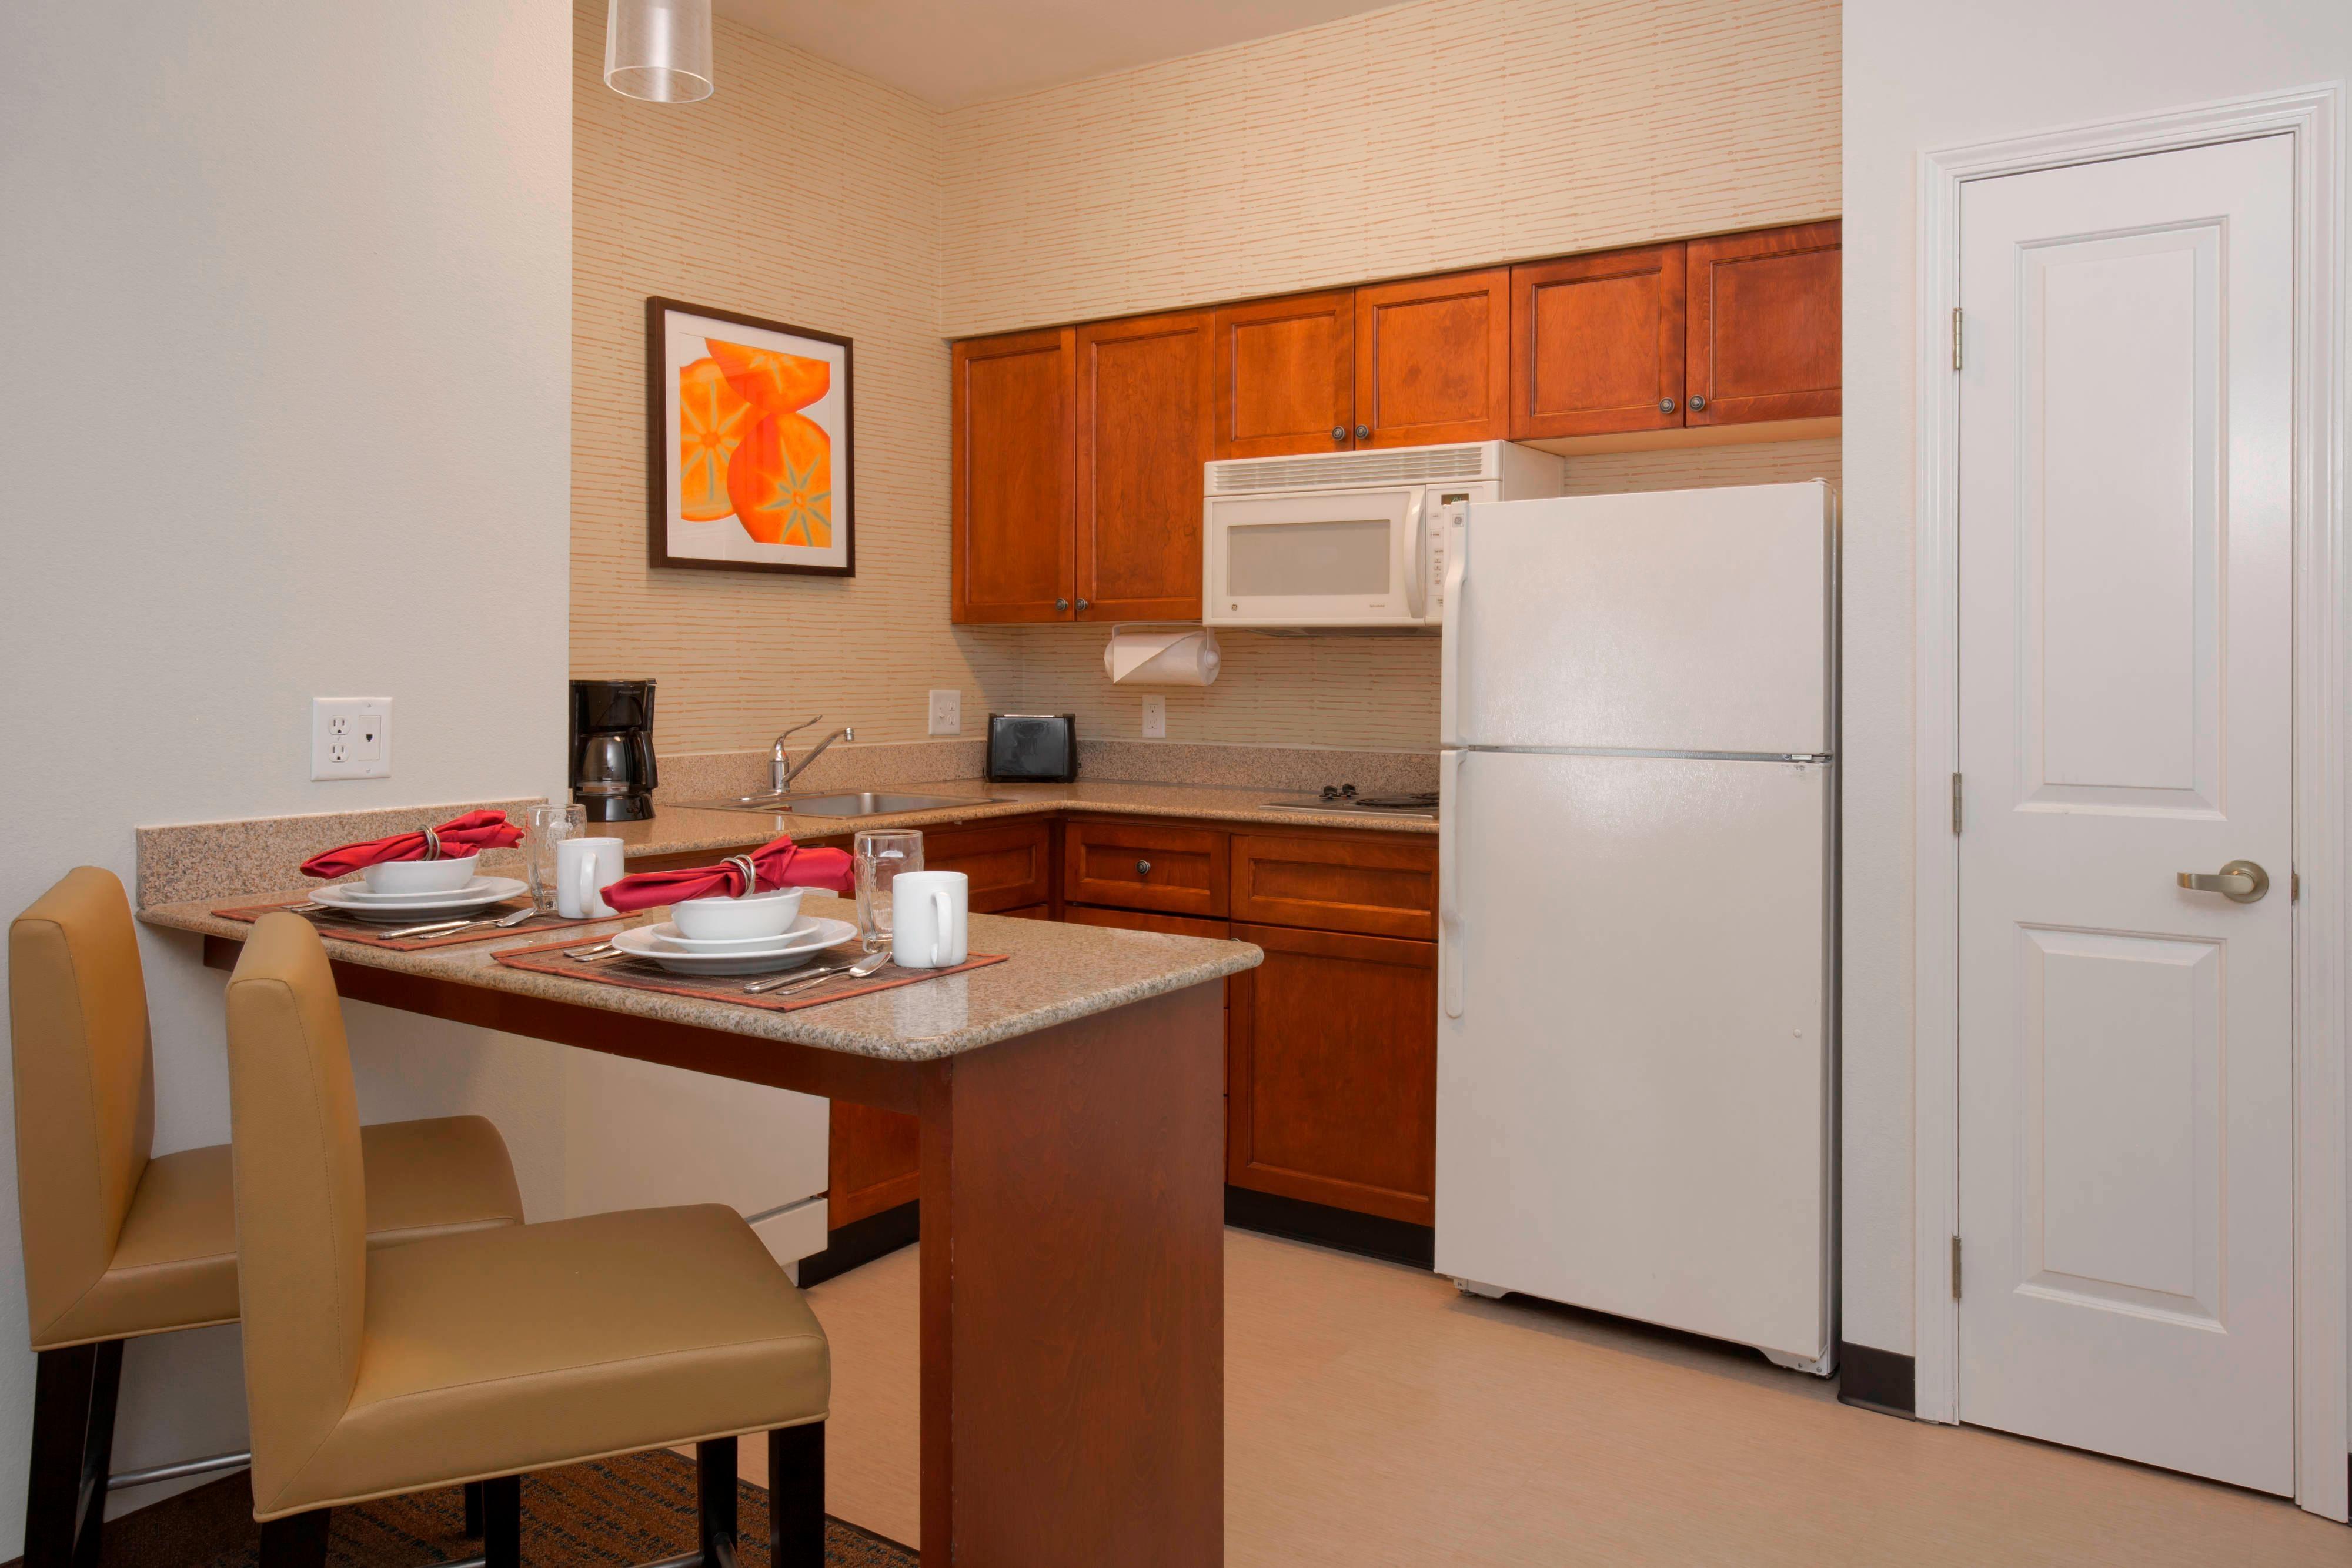 Boise Idaho Hotel Studio Kitchen